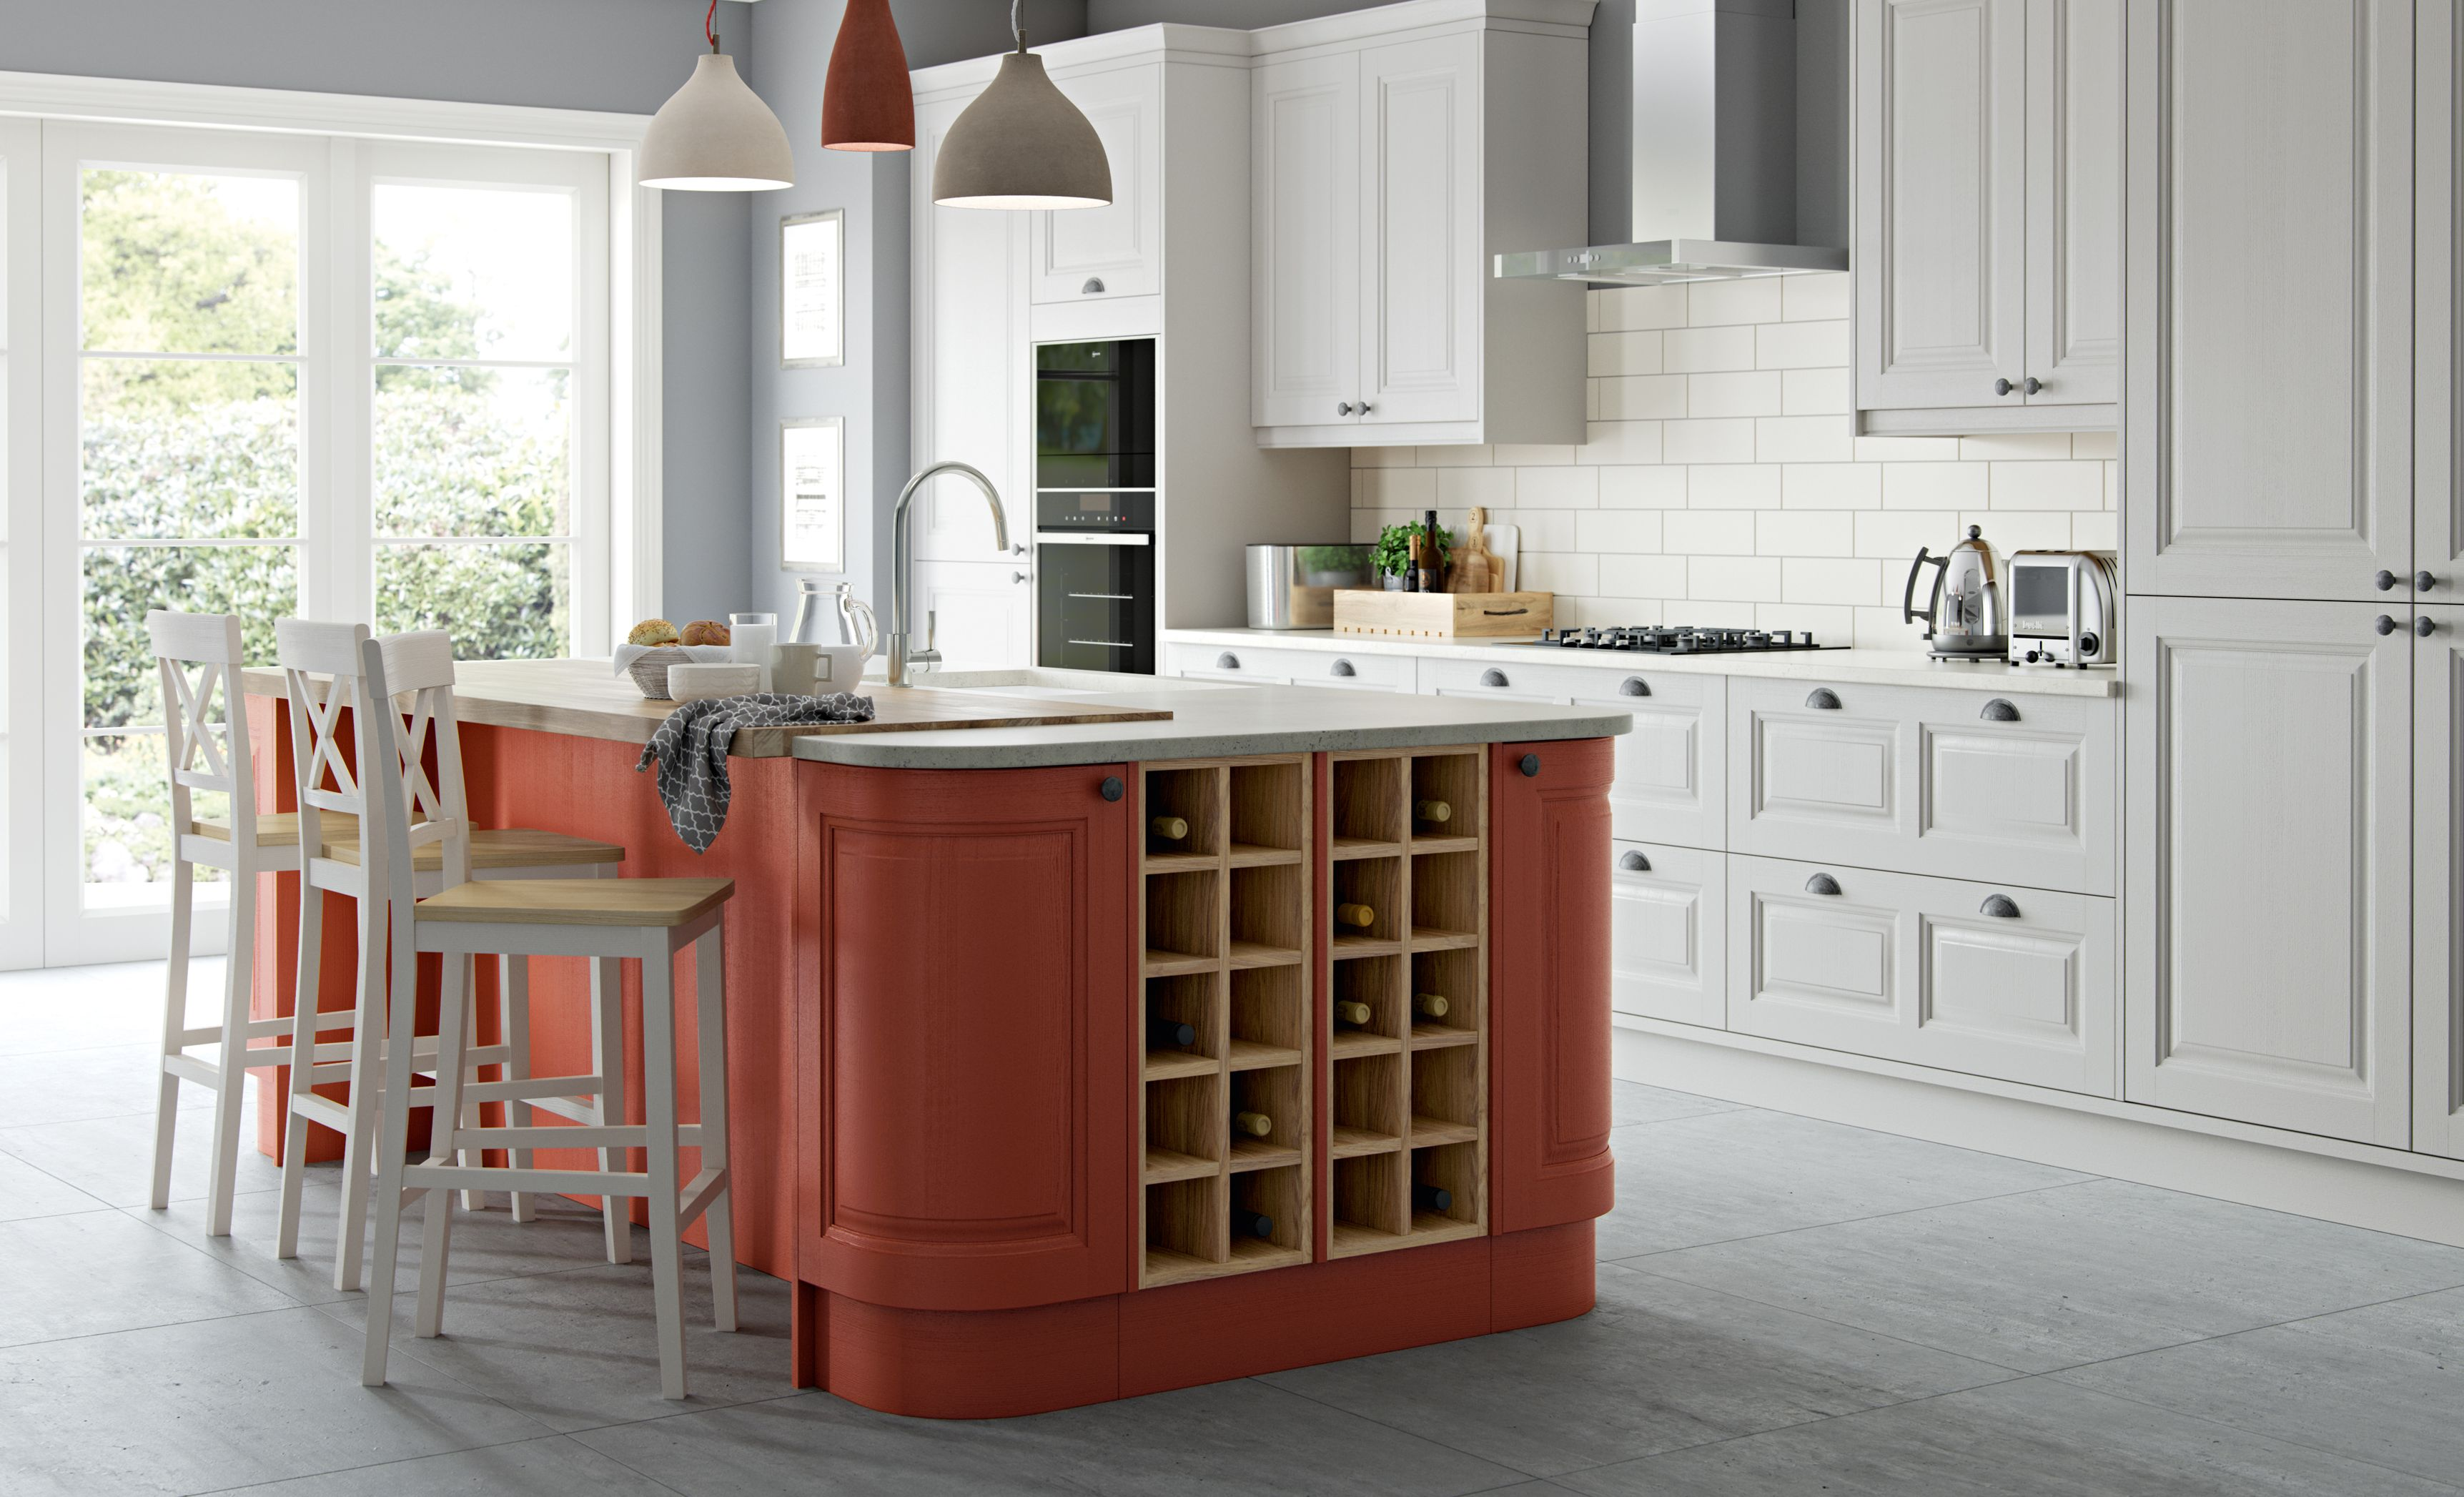 Masterclass Kitchens - Scotts Grey and Terracotta Sunset colour scheme - Carnegie kitchen